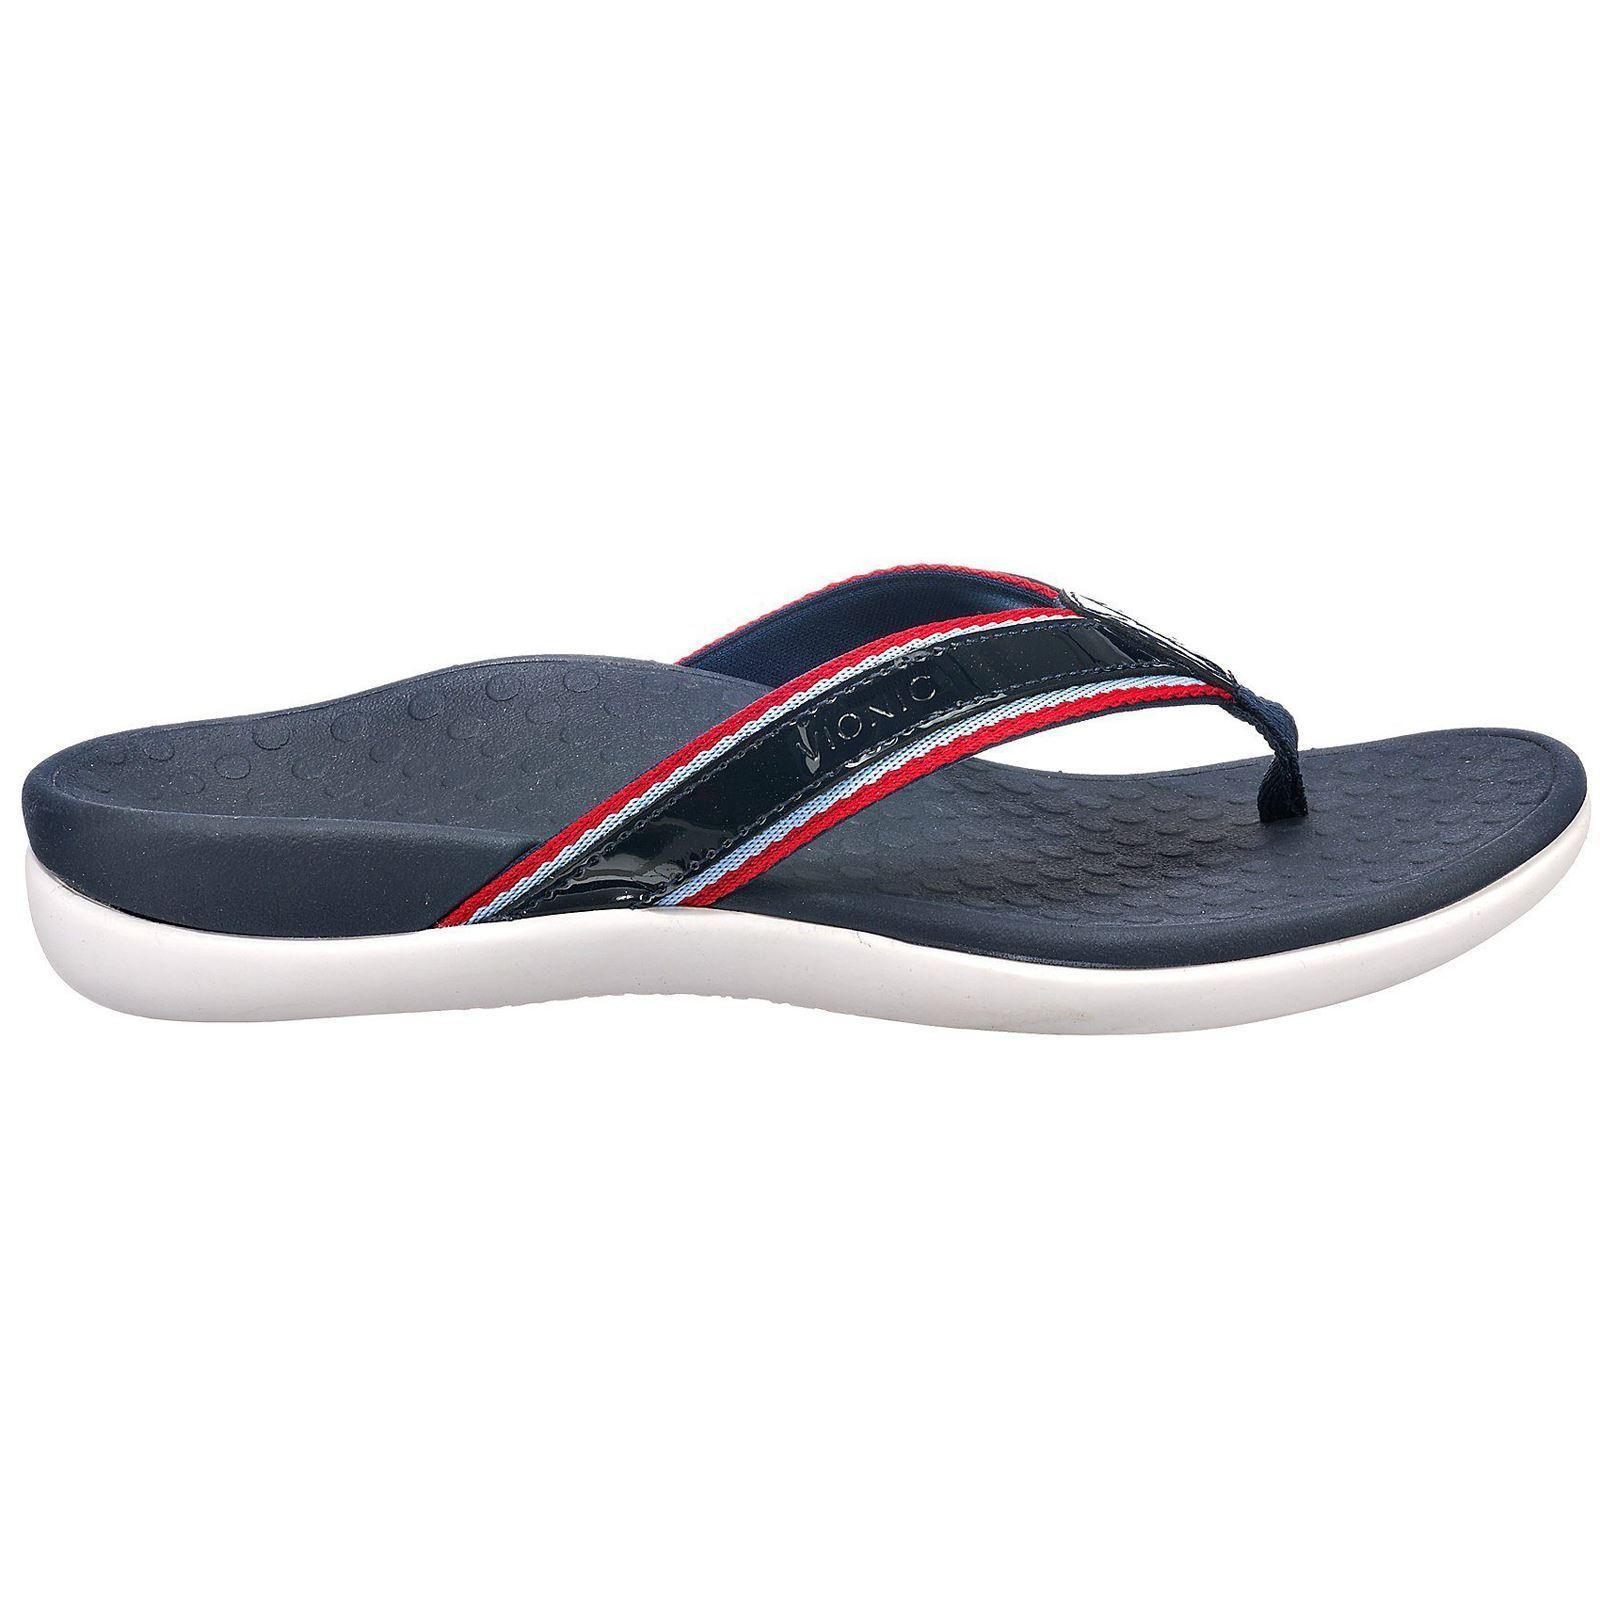 Vionic Rest Islander Comfort Sport Navy Womens Sandals Comfort Islander Slides 1a03e7